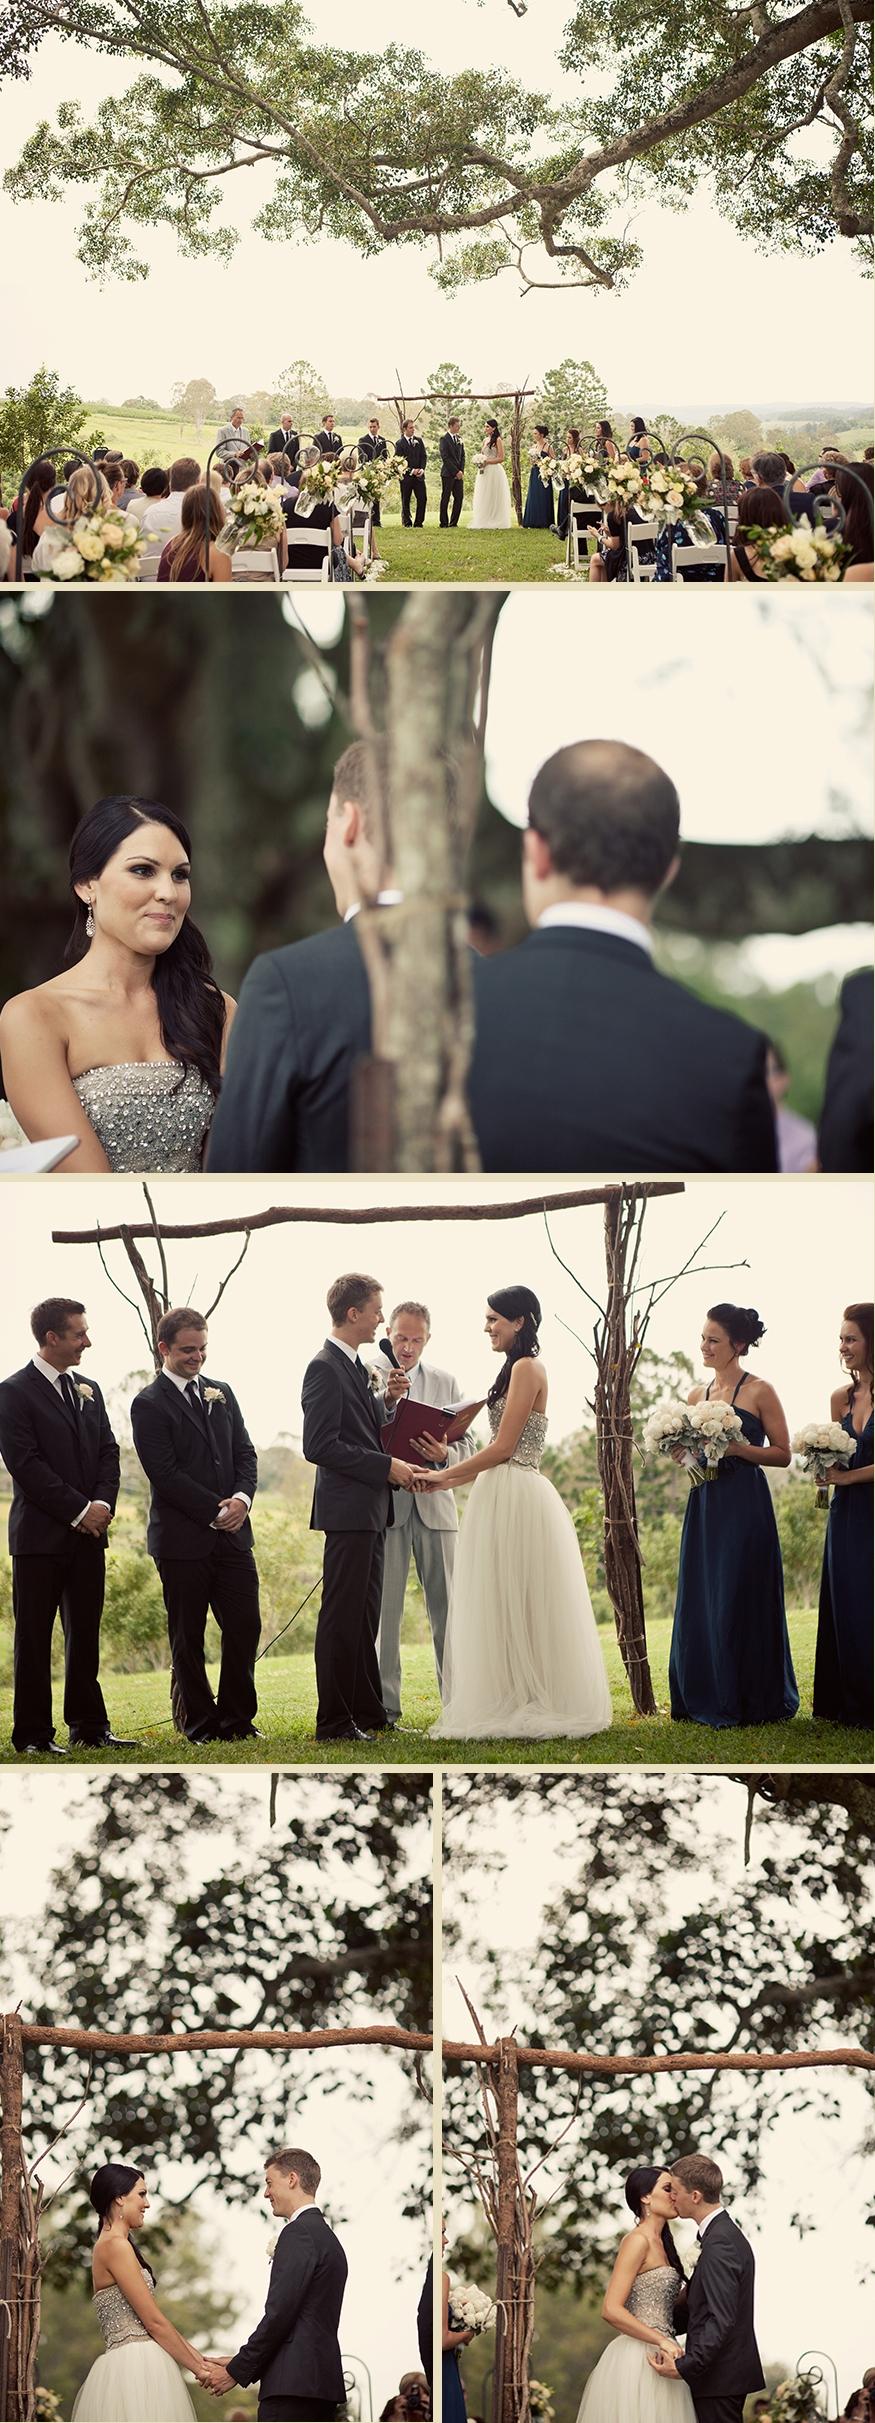 Brisbane Wedding Phoographer Blog collage-1327373810461